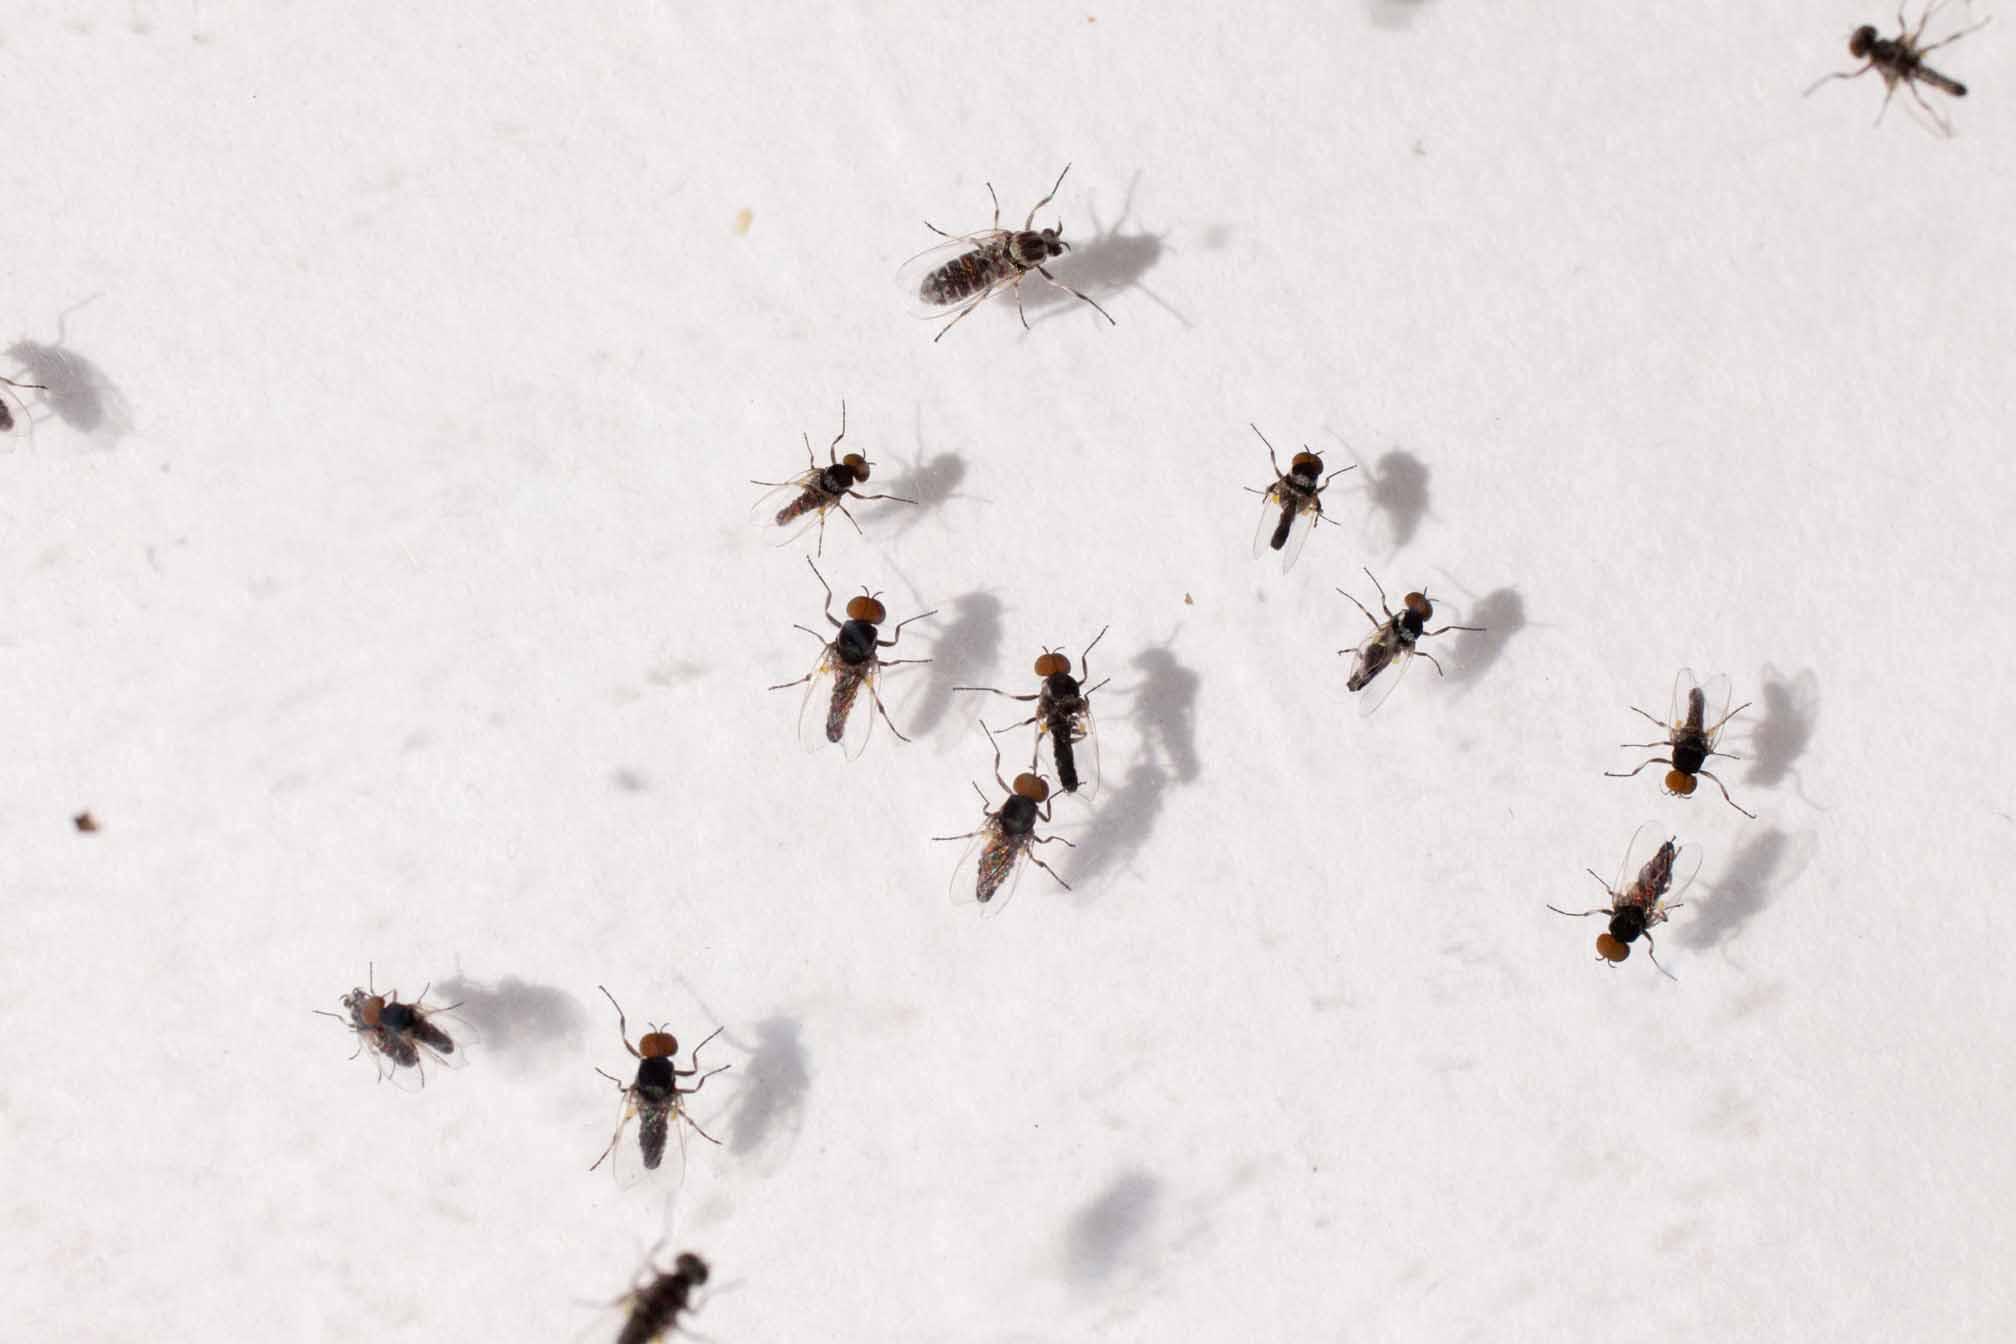 A group of black flies